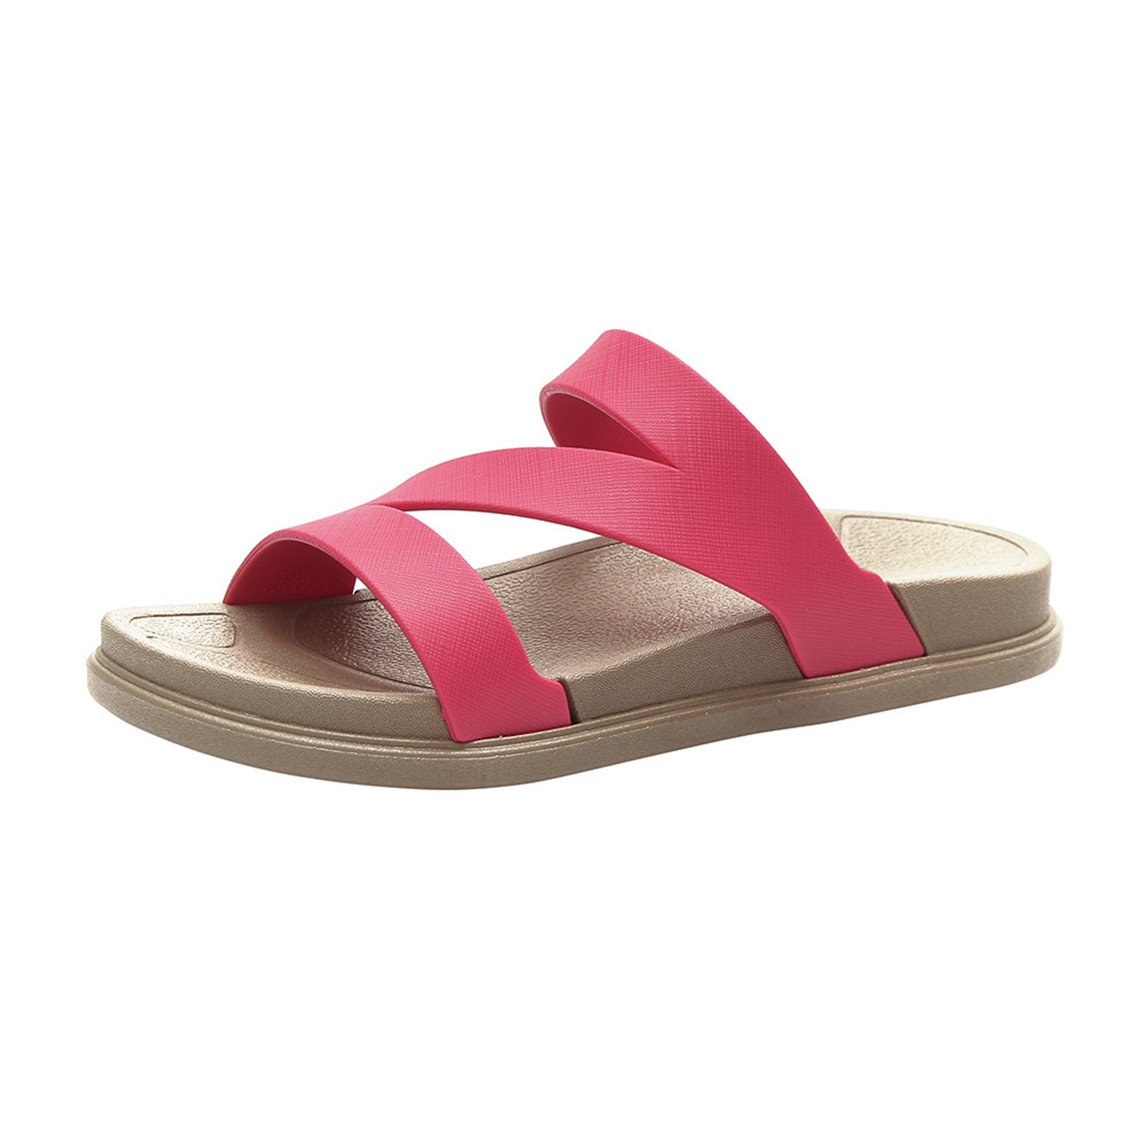 2018 New Ladies Summer Beach Bath Slippers Casual Wedge Sandals Women Shoes B07BNQVSMN 7 B(M) US|Hot Pink